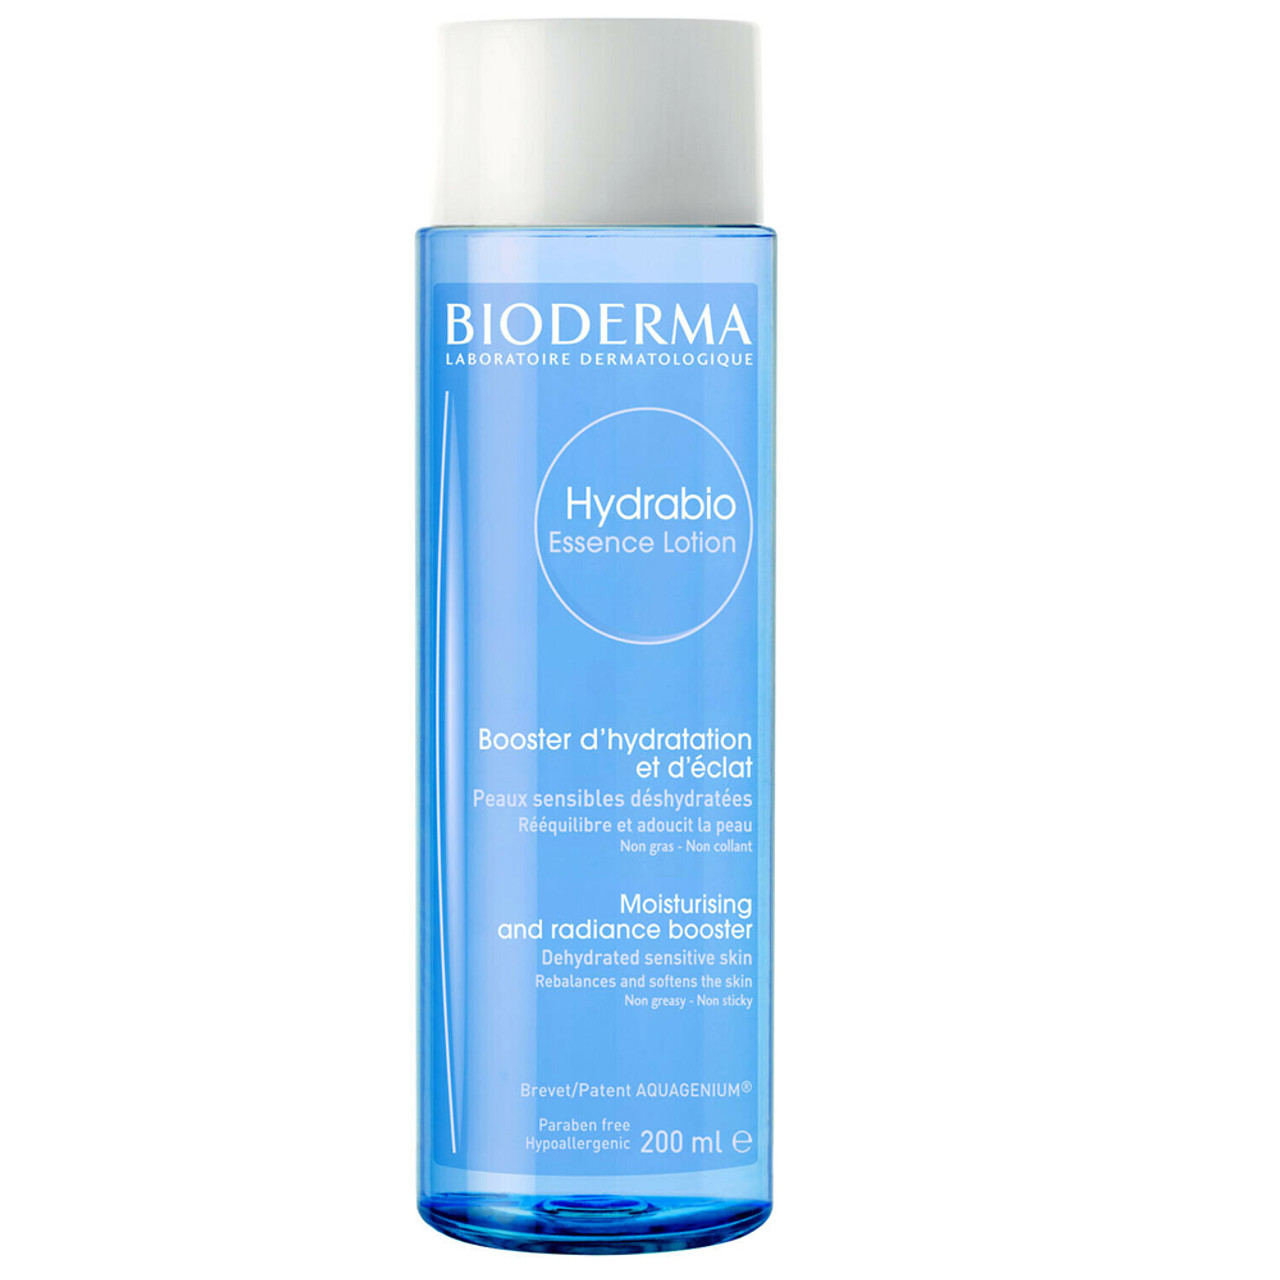 Bioderma Hydrabio Essence Lotion